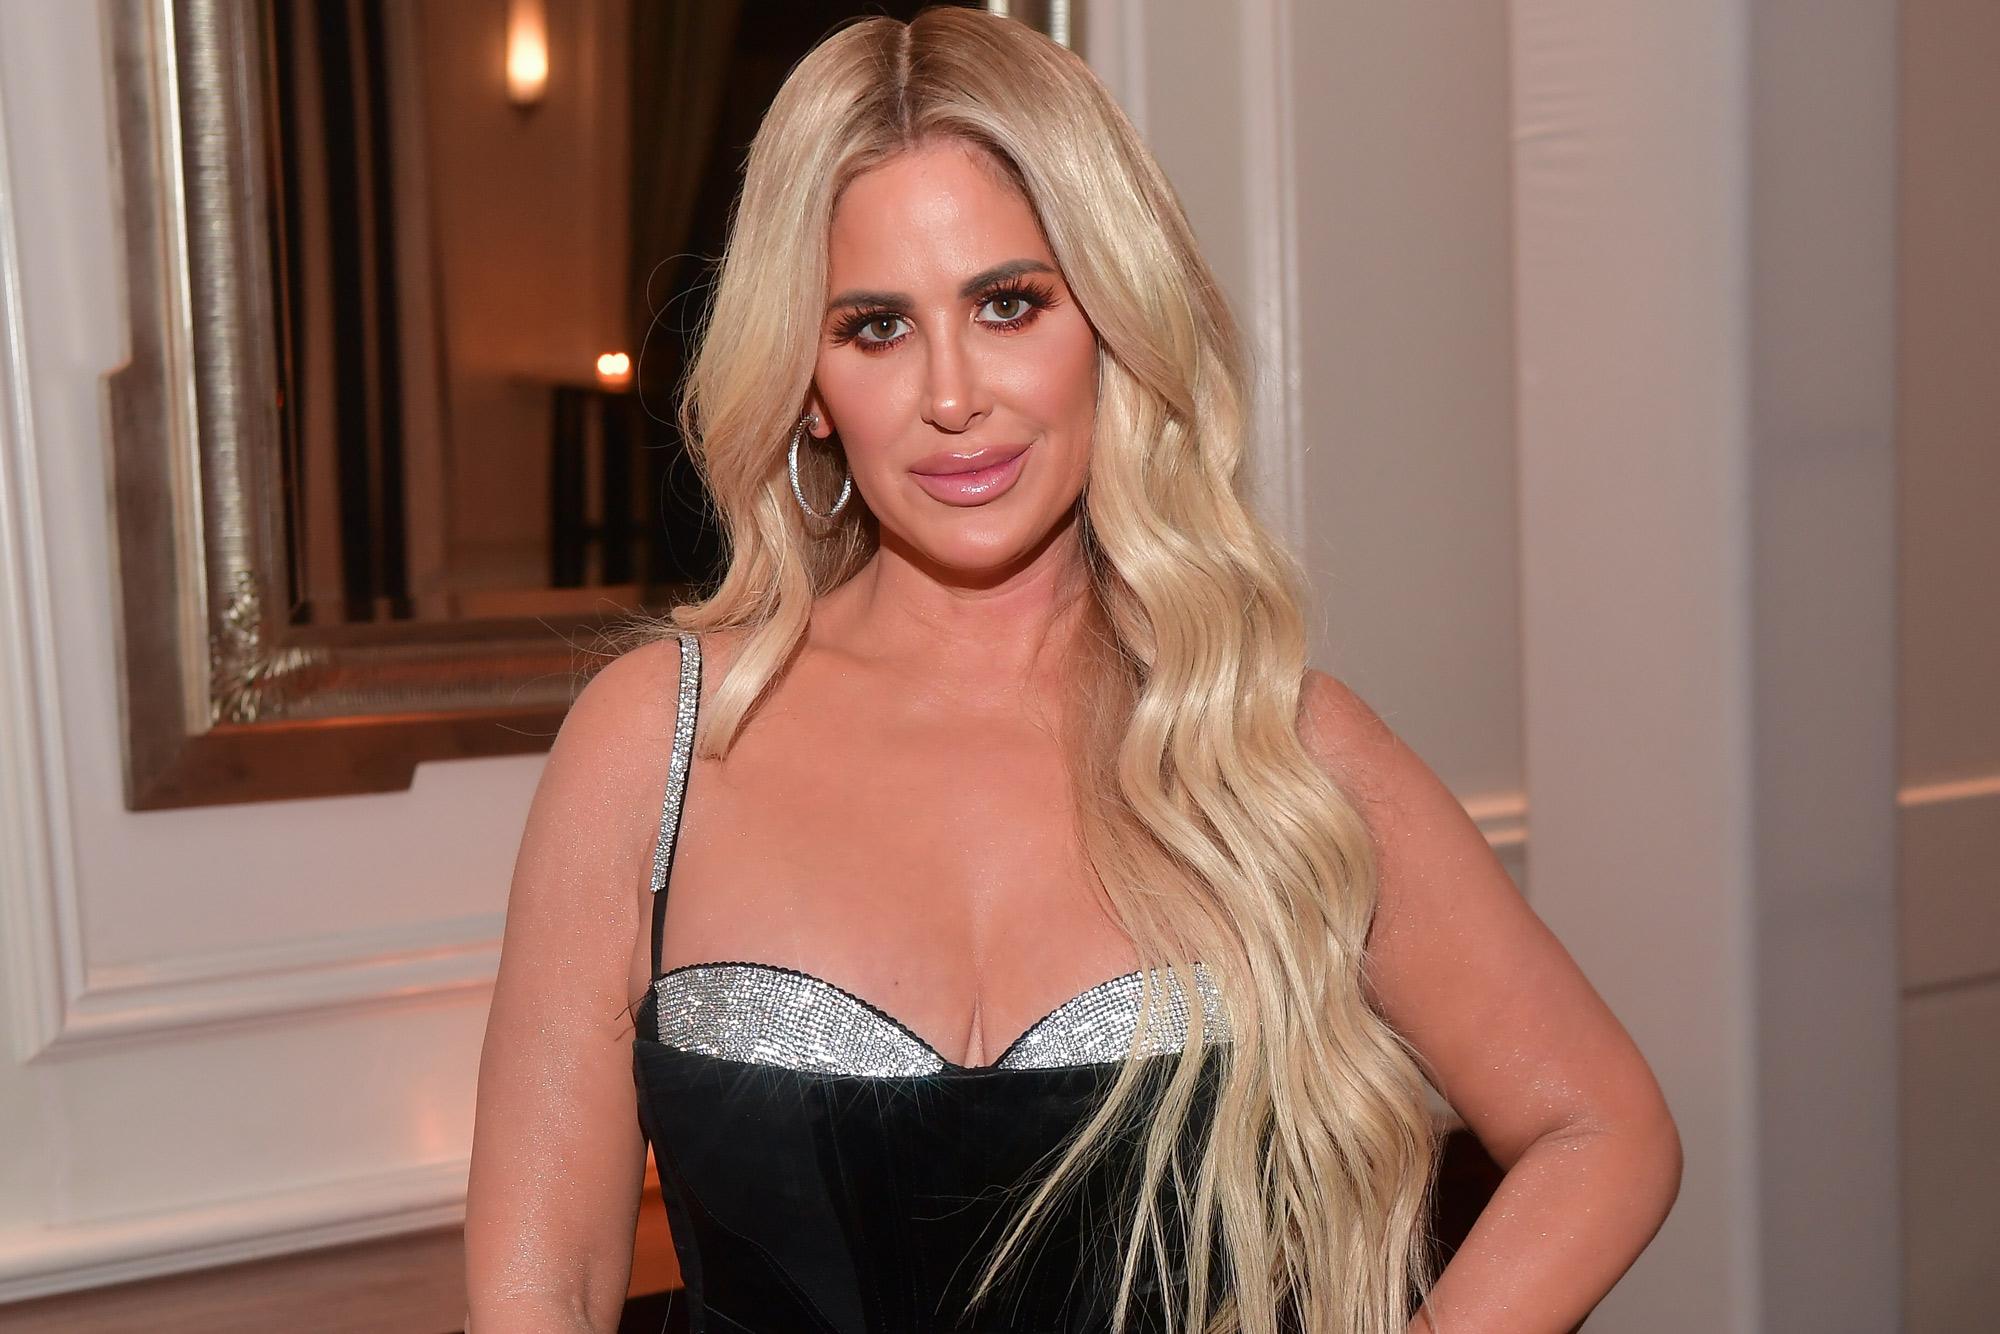 Kim Kardashian Nipples Uncensored photo 20